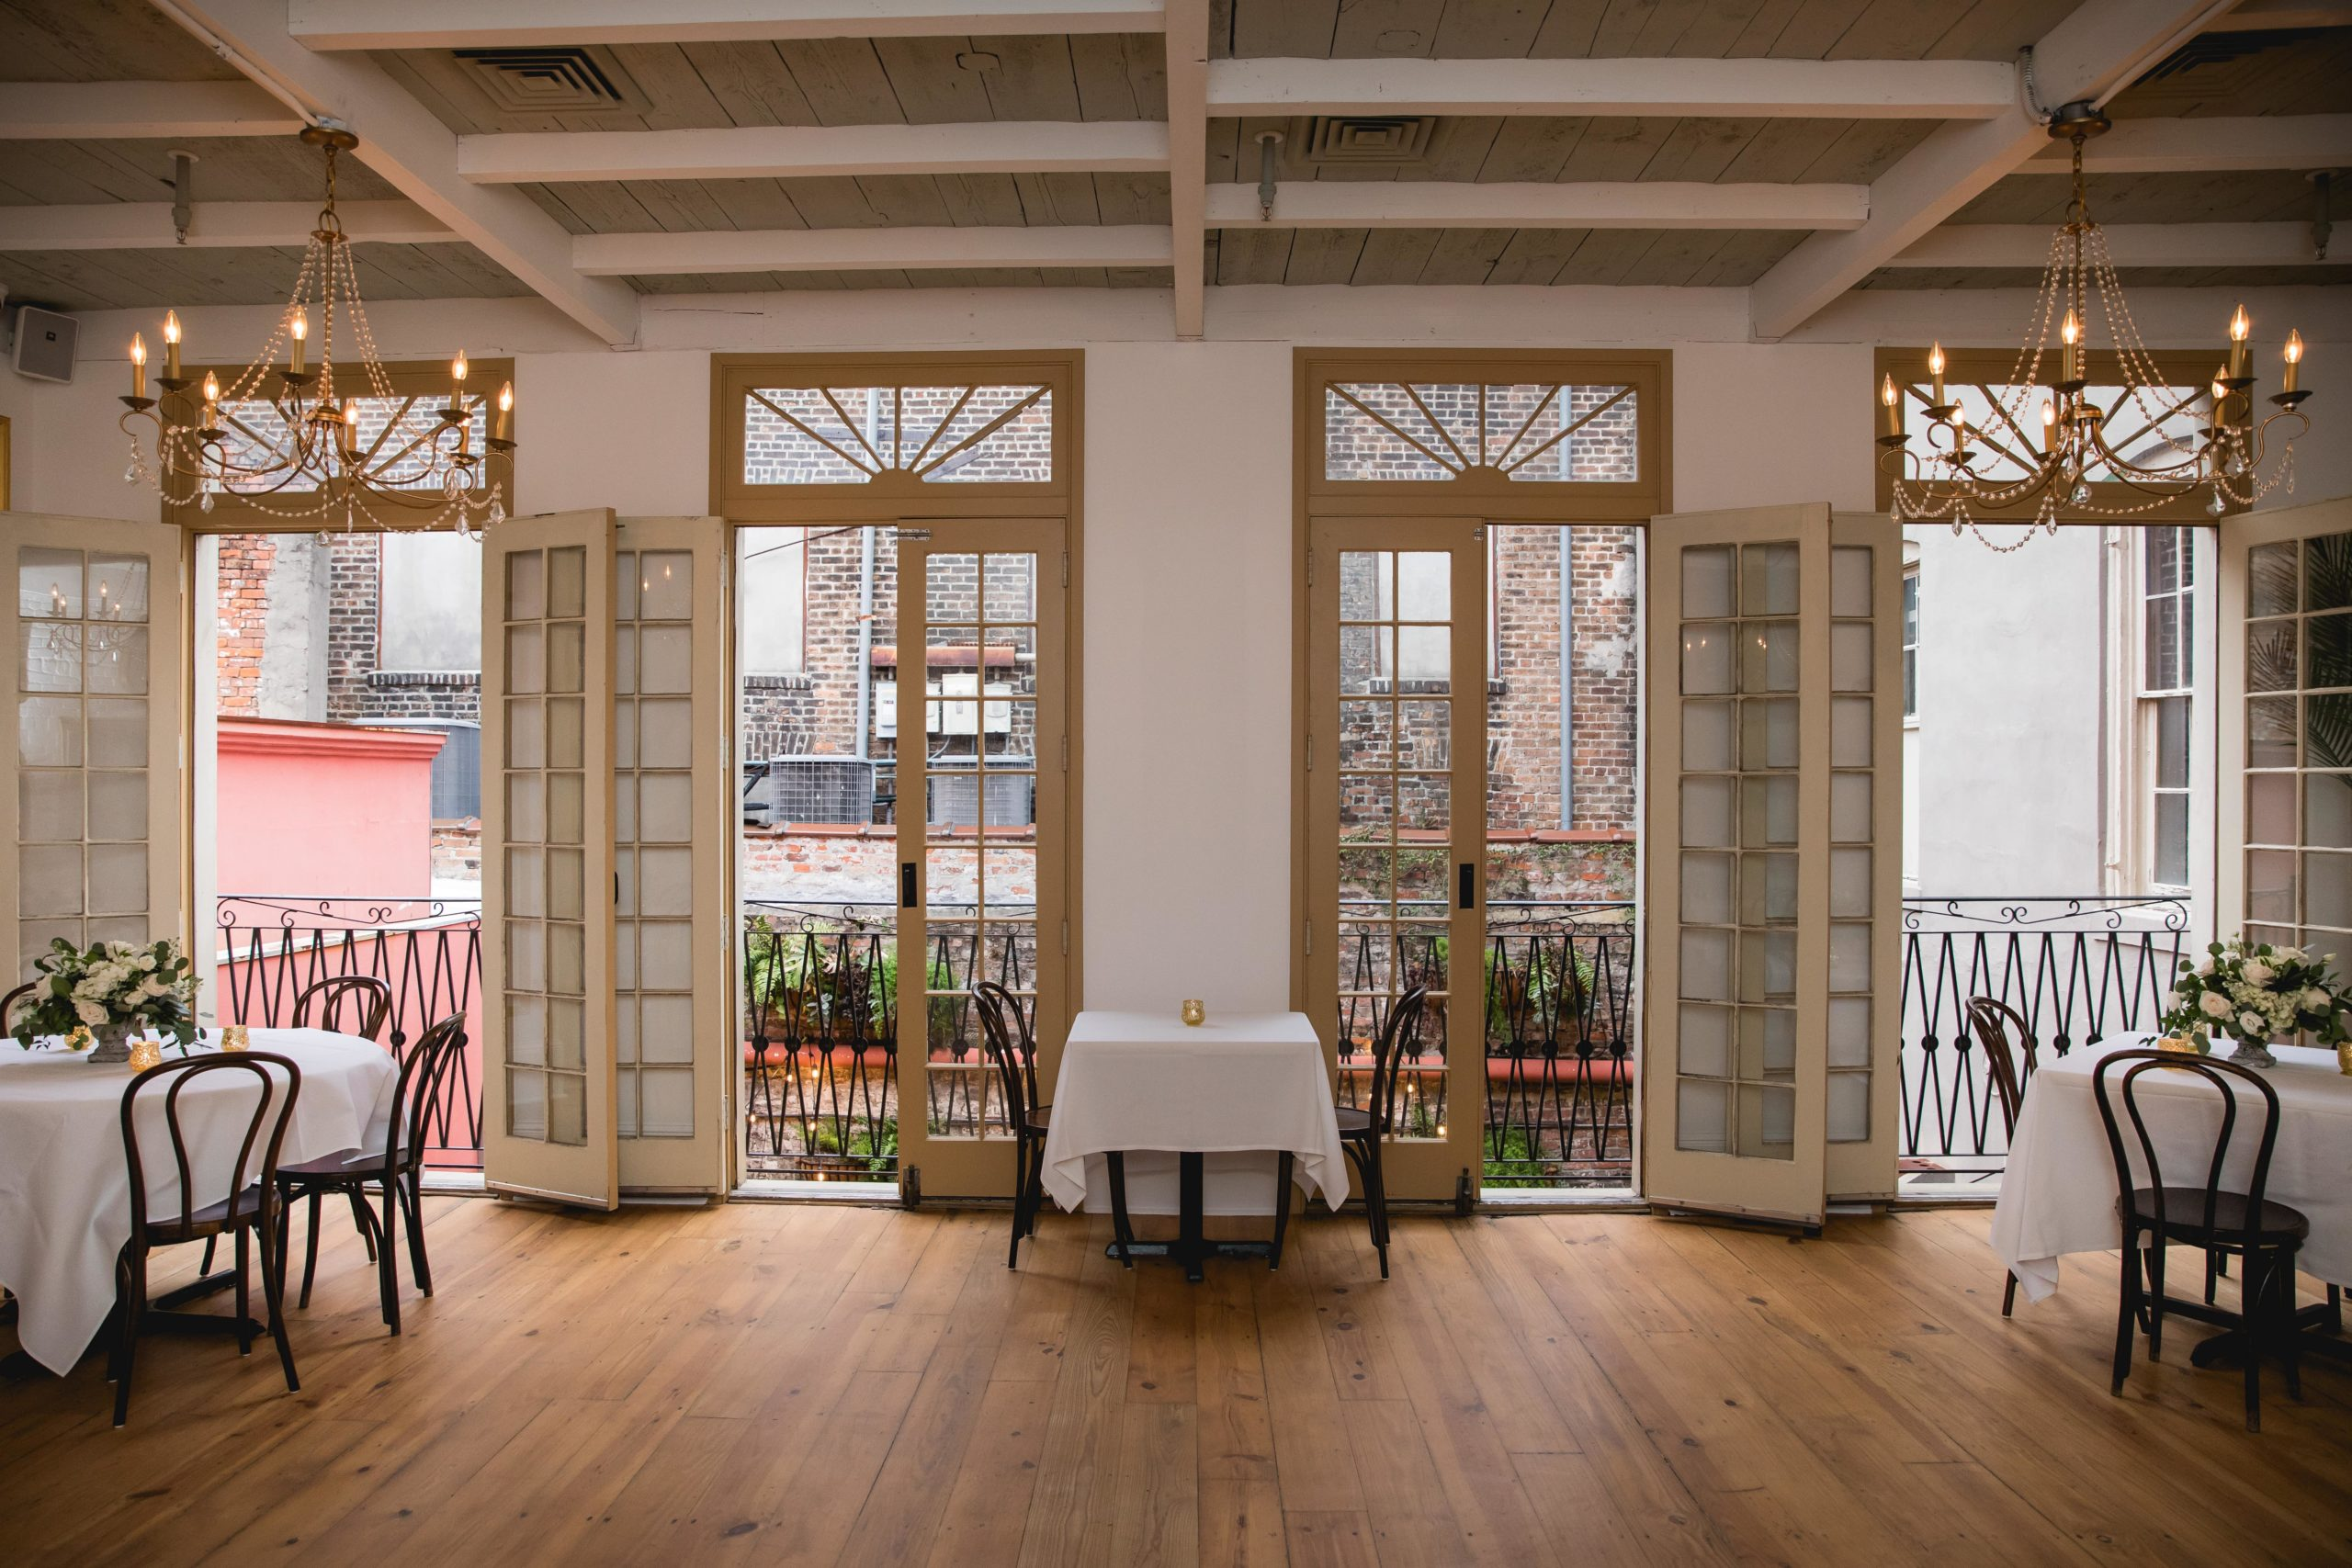 tujagues-restuarant-dining-room